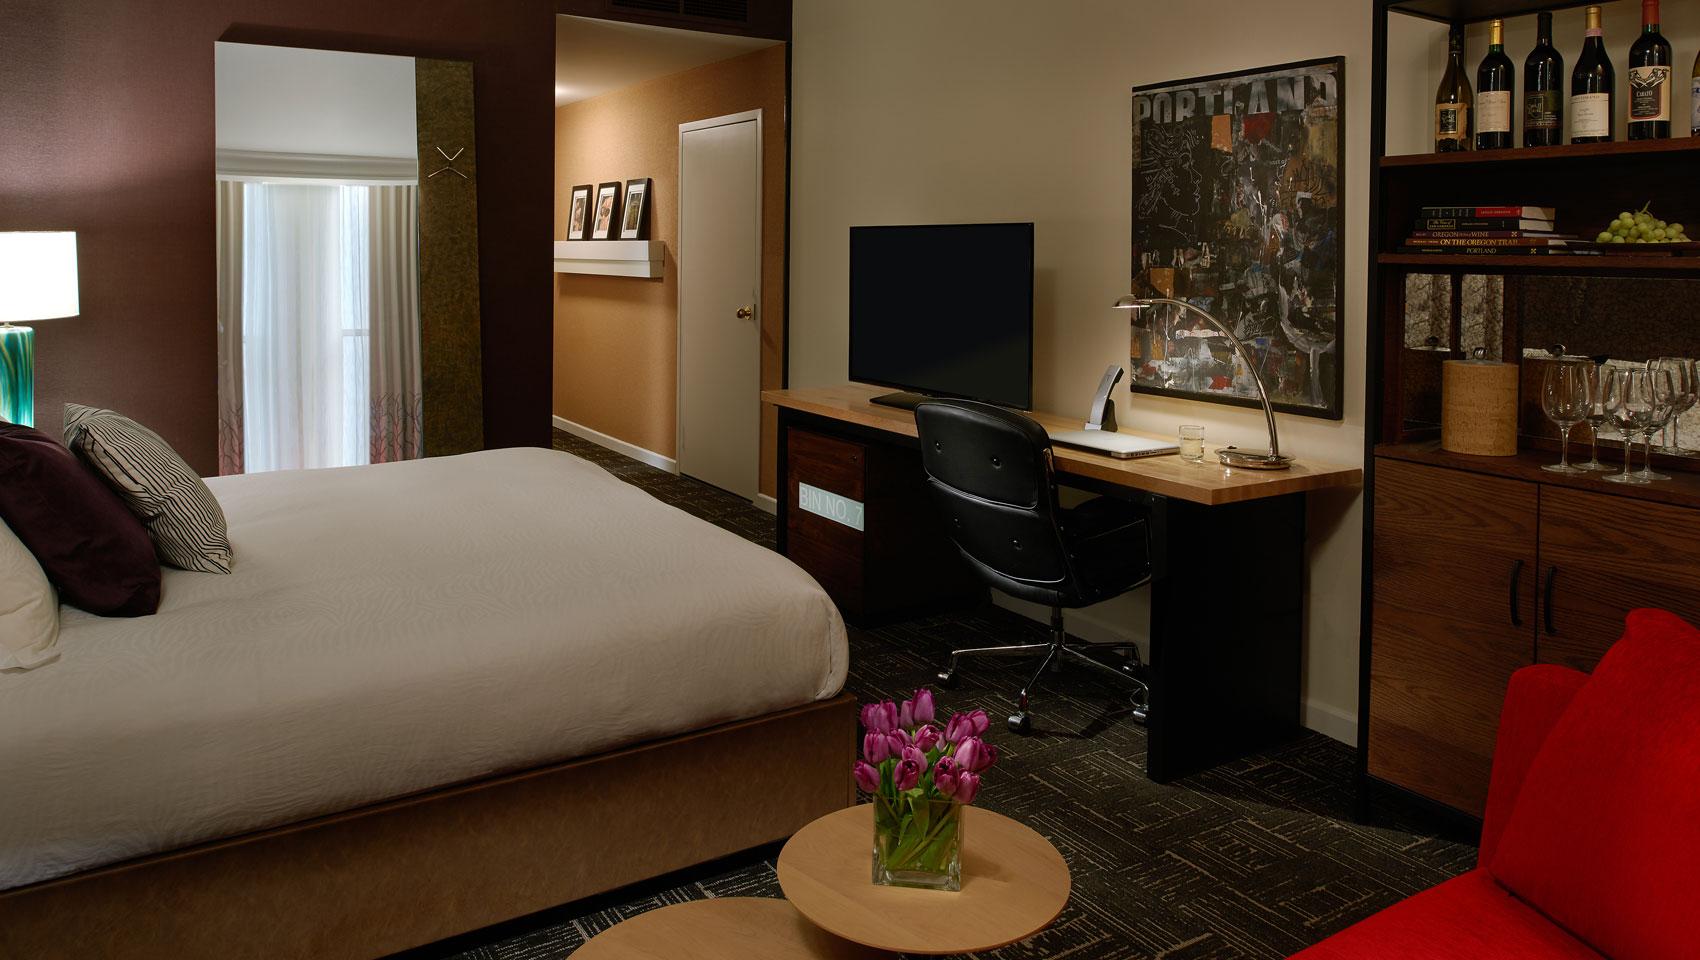 Downtown portland boutique hotel rooms vintage portland for Kimpton hotel decor